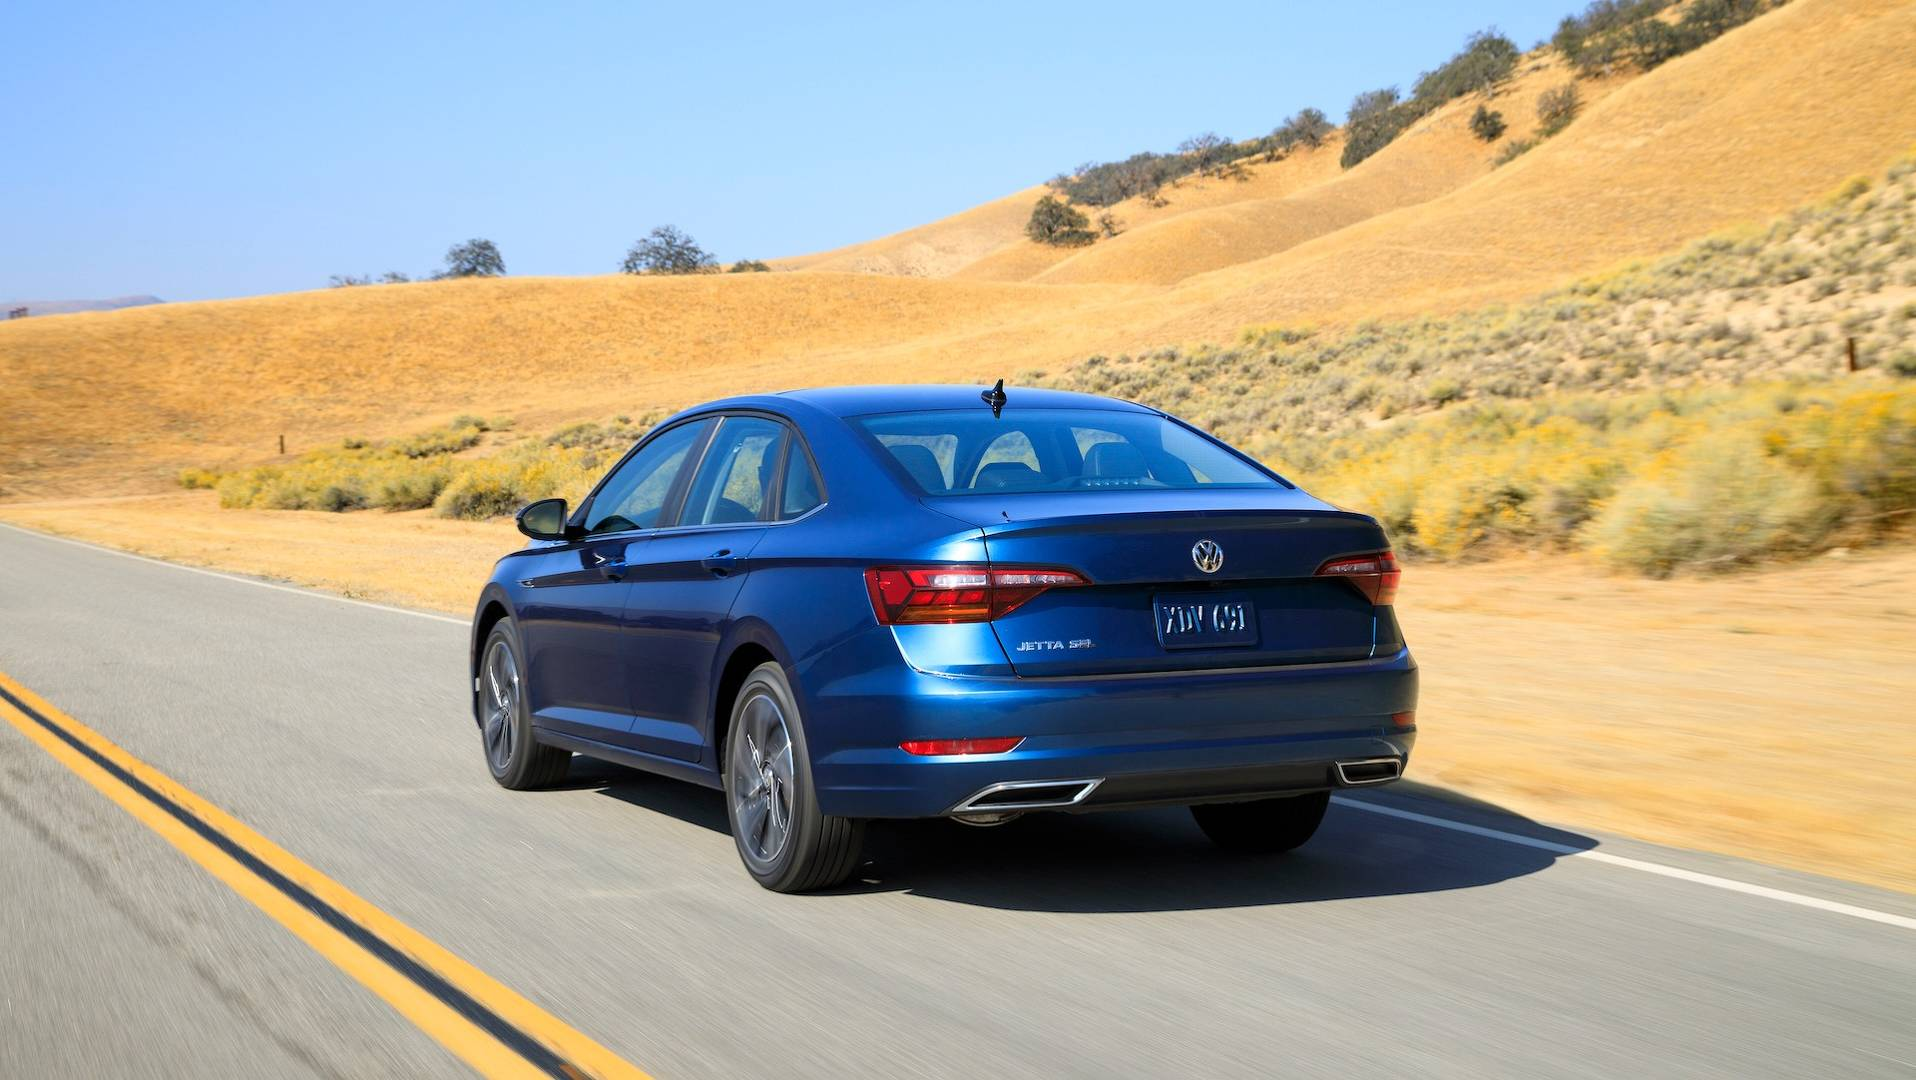 2020 Volkswagen Jetta GLI Confirmed With Independent Rear Suspension - autoevolution